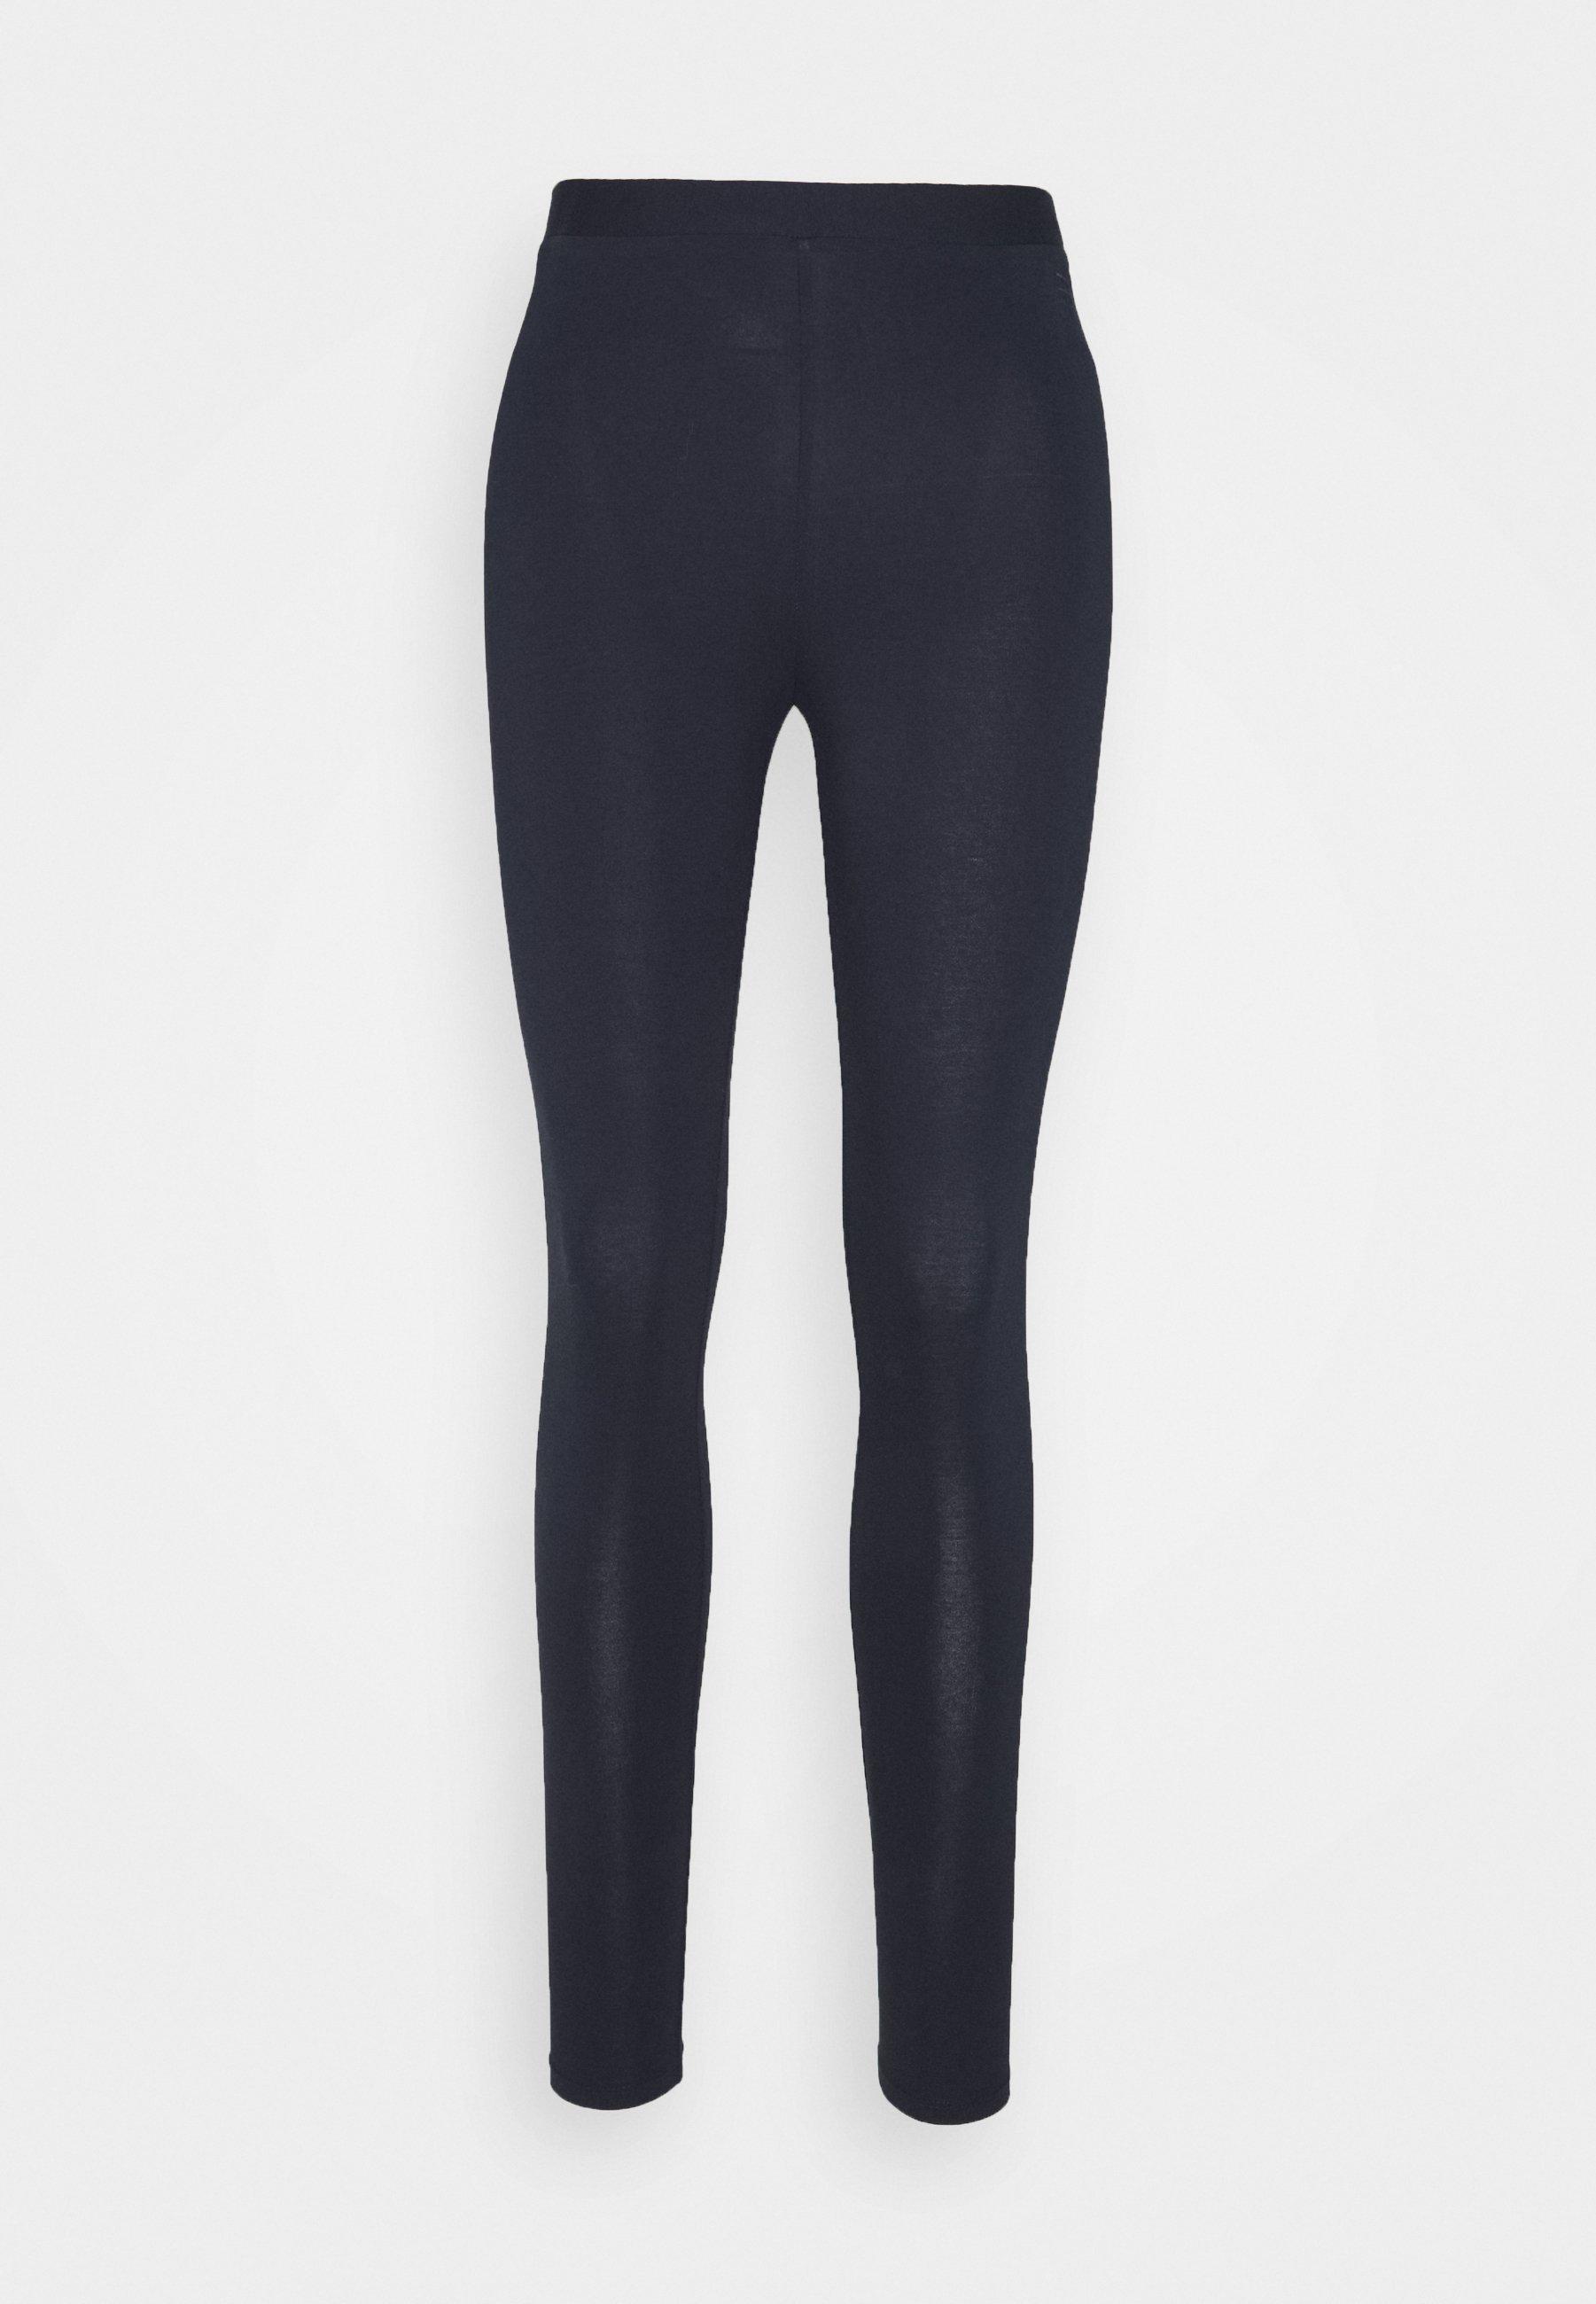 Damen CORE - Leggings - Hosen